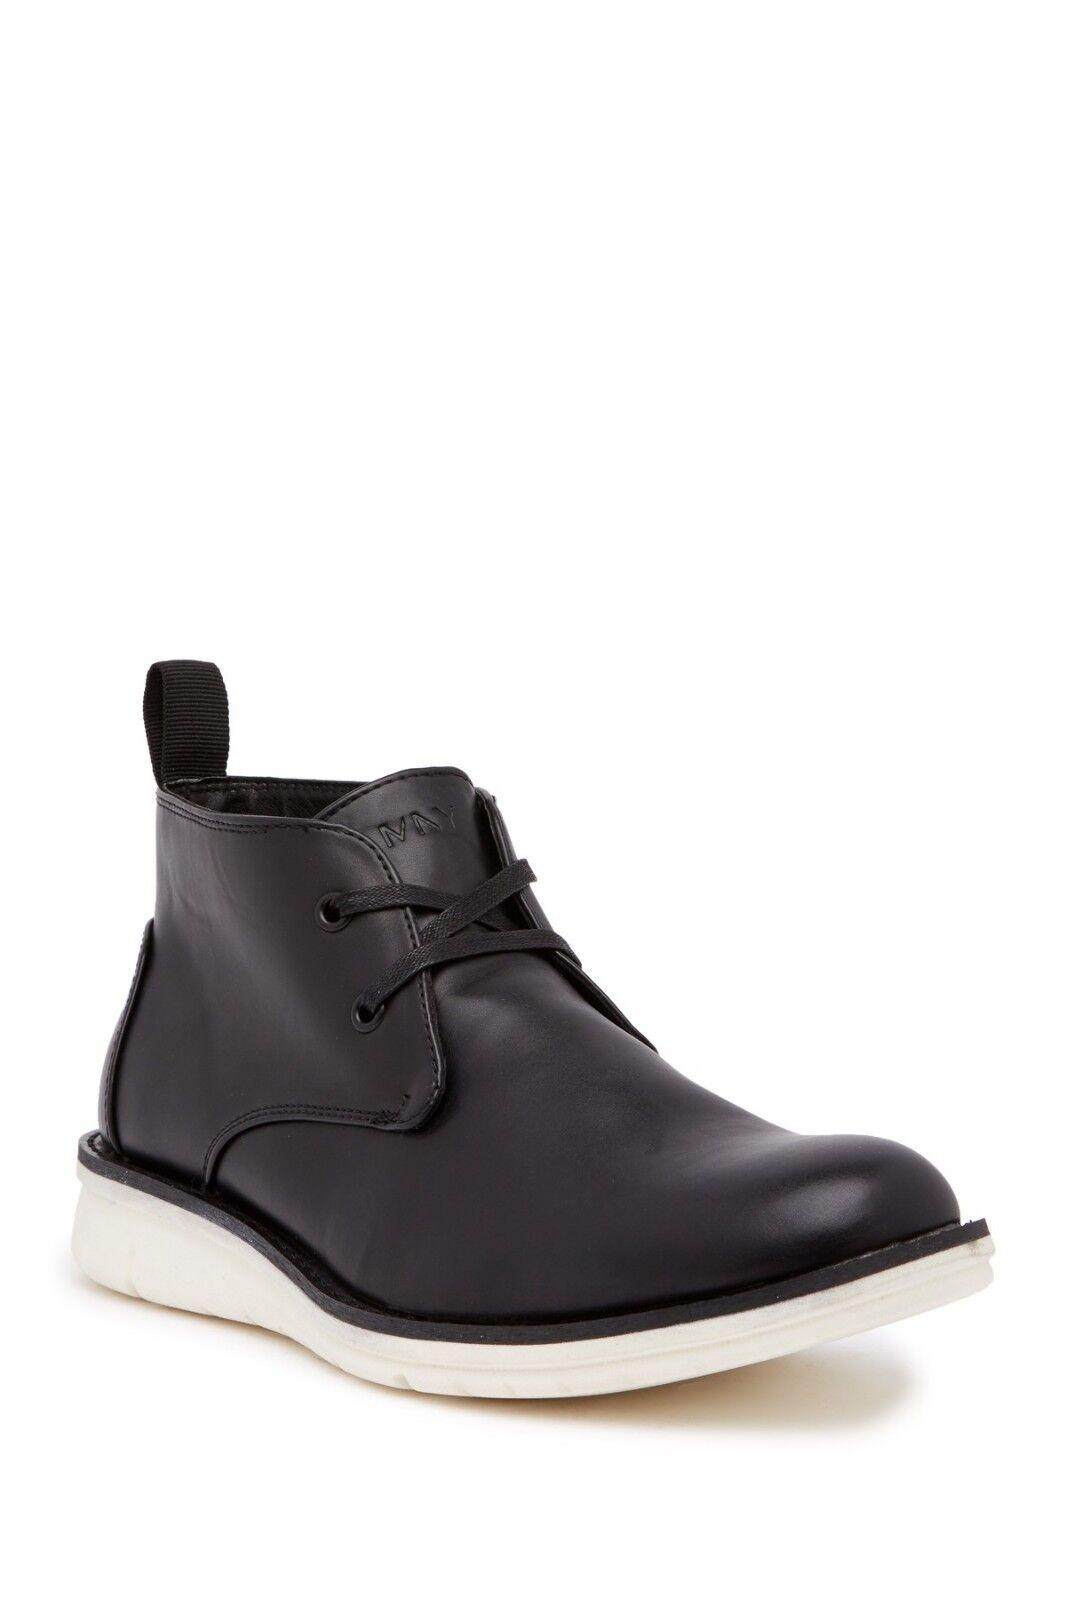 New Marc New York Thompson Chukka Boots men's shoes